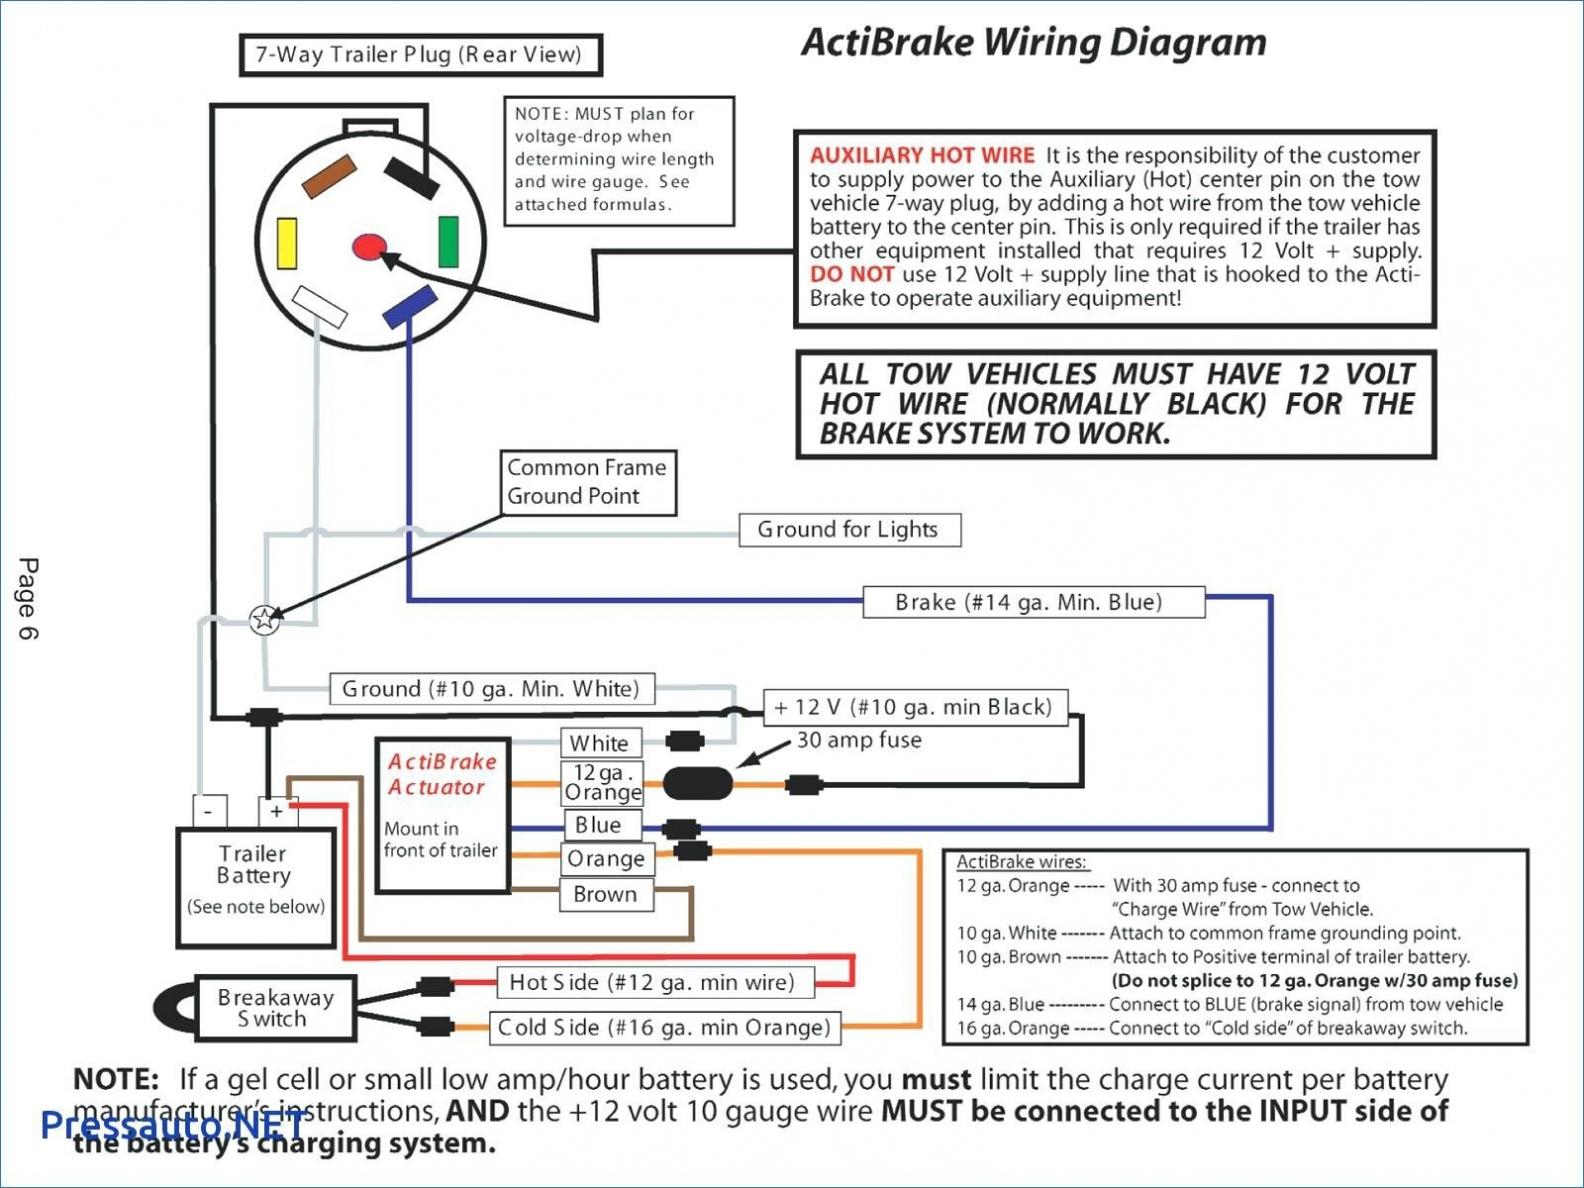 Trailer Connector Wiring Diagram 7 Way — Daytonva150 - Trailer Connector Wiring Diagram 7 Way